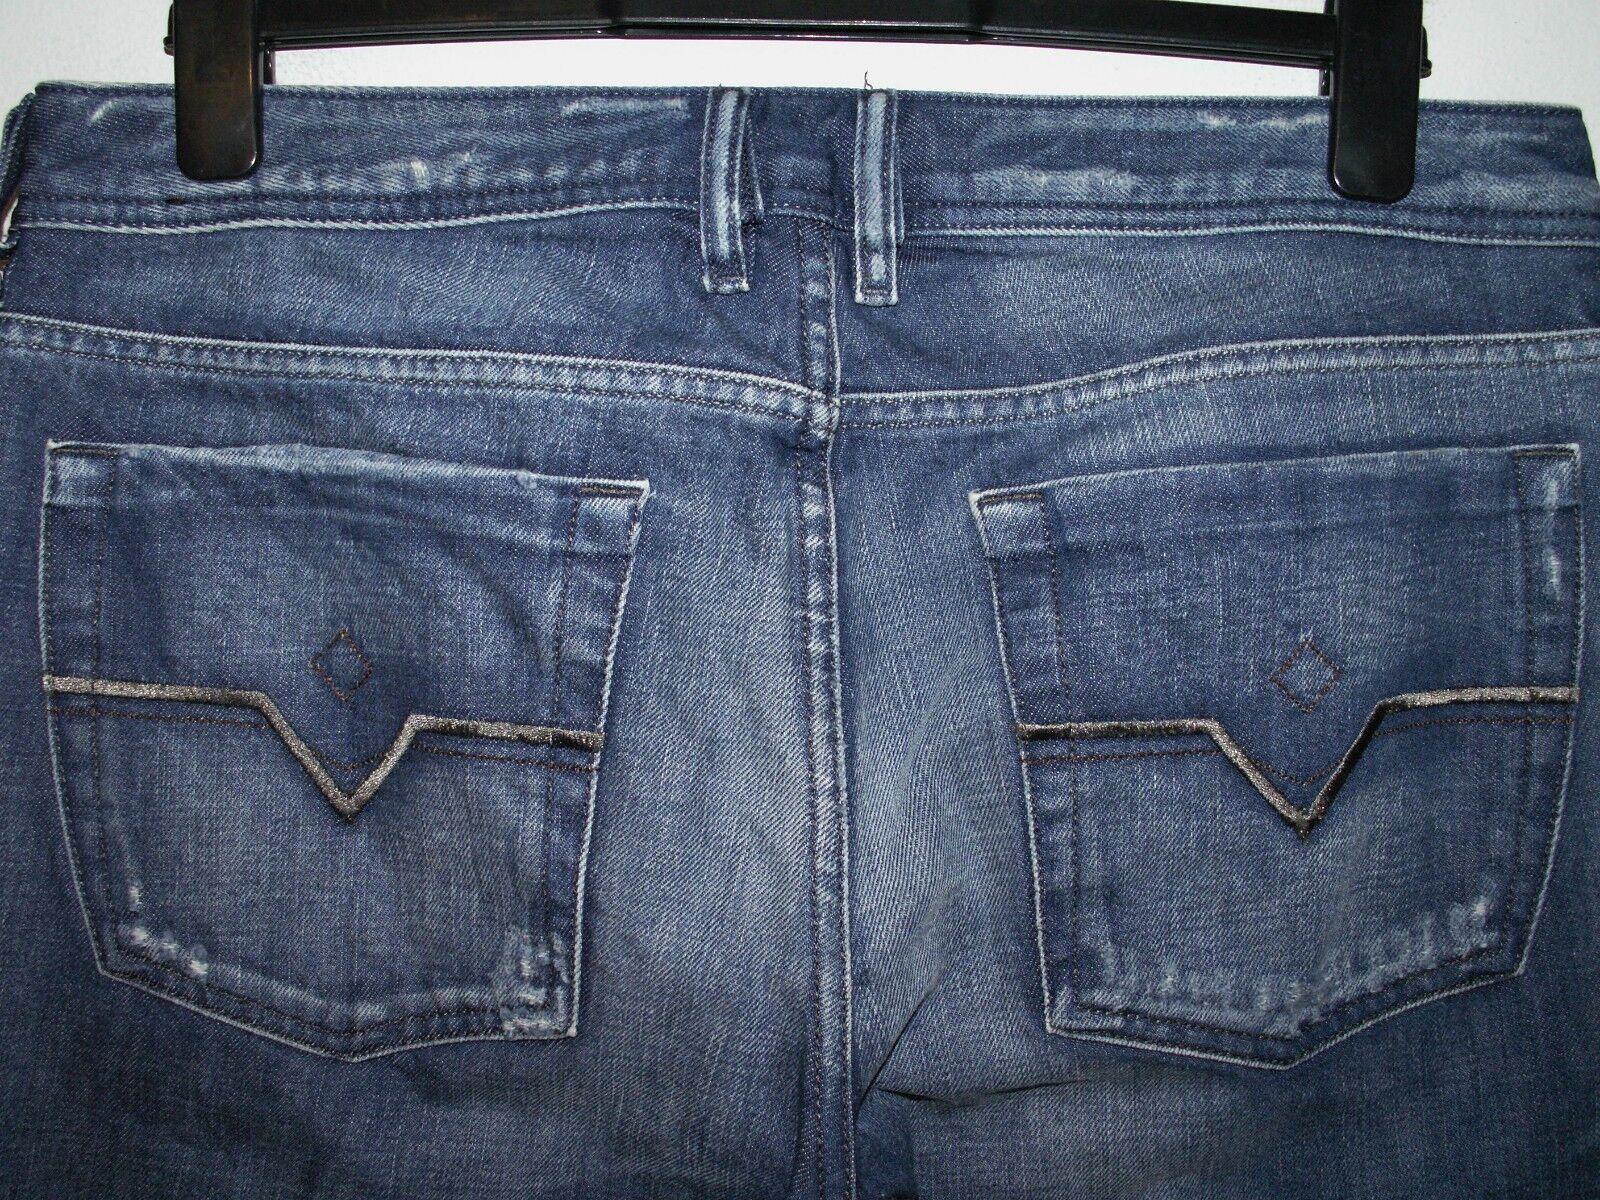 Diesel ZATHAN botacut Jeans 00772 W34 L32 (5255)   100% garantía genuina de contador